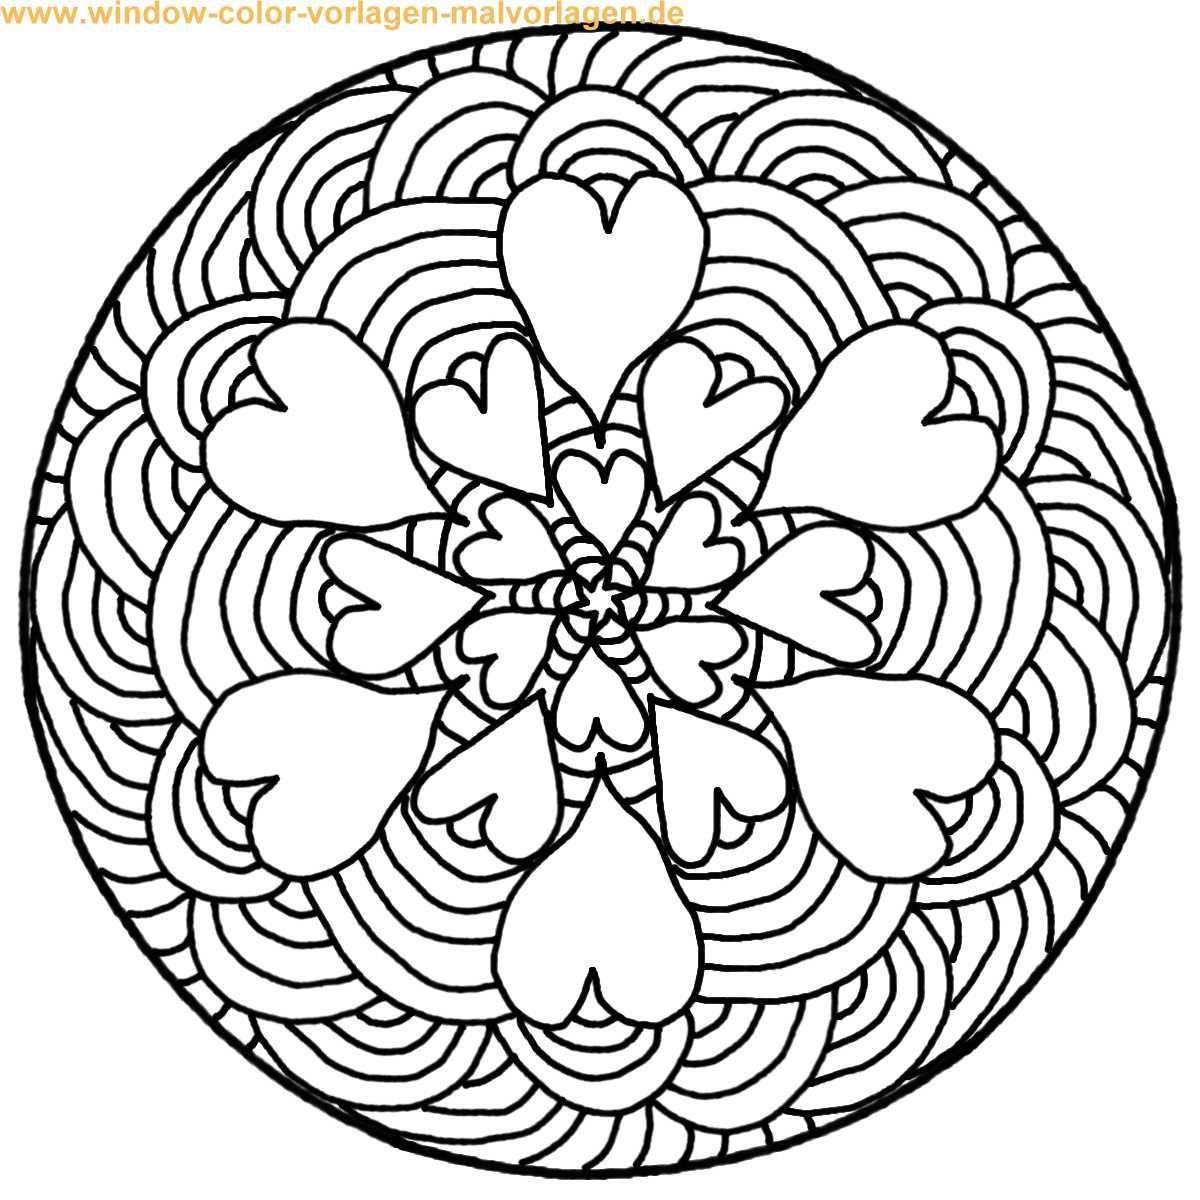 Mandala Zum Ausdrucken Ausmalbilder Fur Kinder Mandala Zum Ausdrucken Ausmalbilder Mandalas Zum Ausmalen